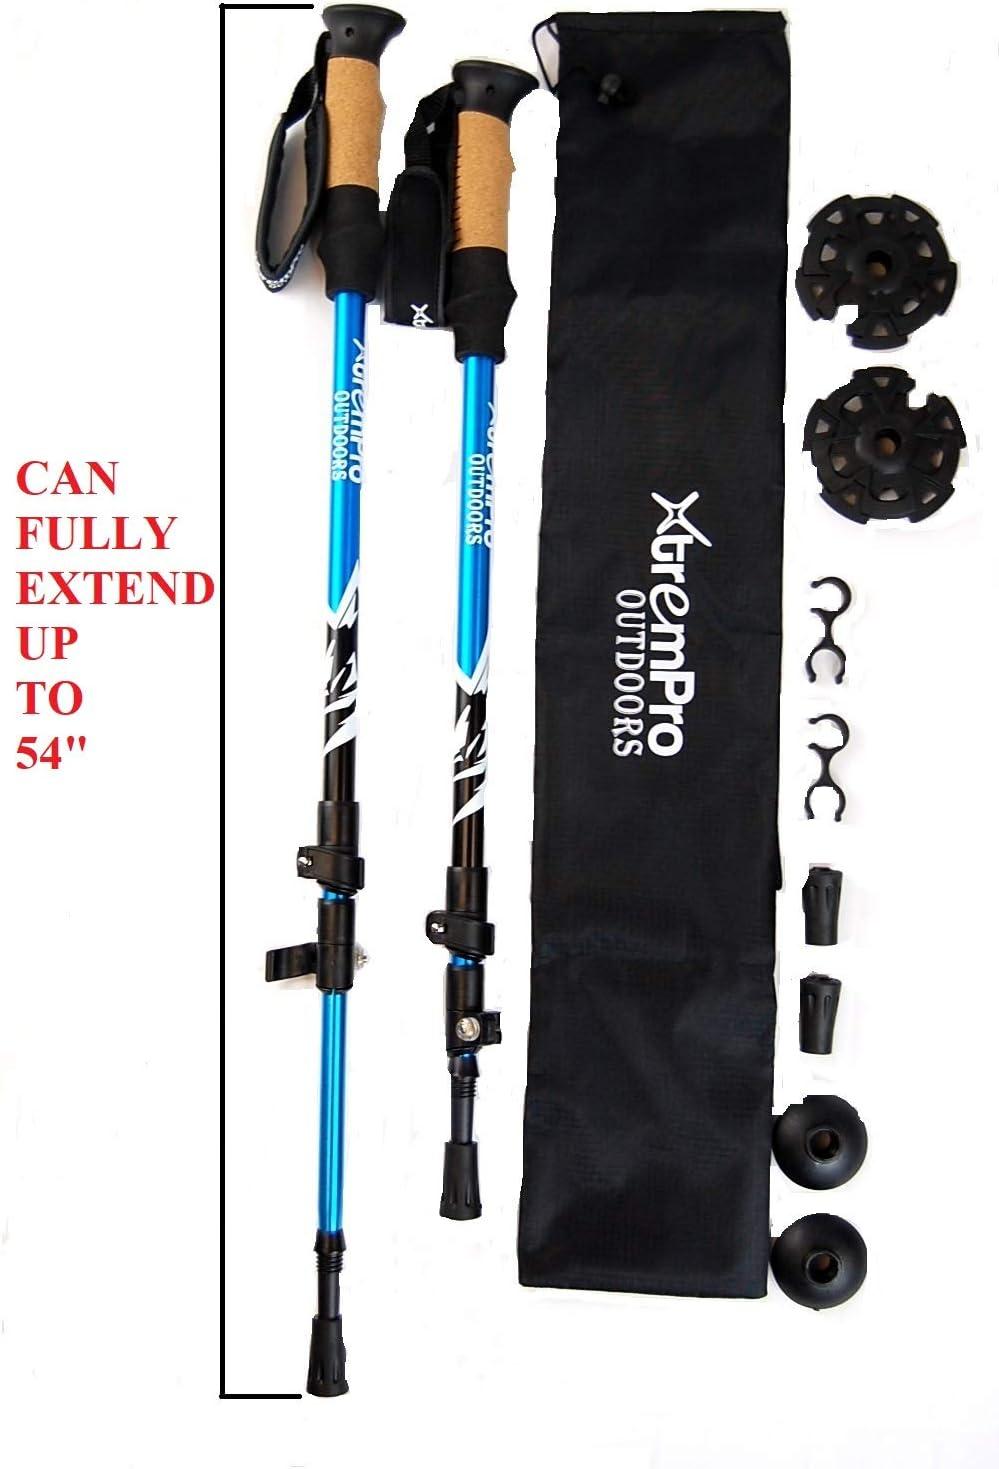 Xtrempro 2 Piece Trekking Adjustable Poles and Snowshoes Set Snow Terrain Kit Ergonomic Bundle Lightweight Aluminum with Carrying Tote Bag